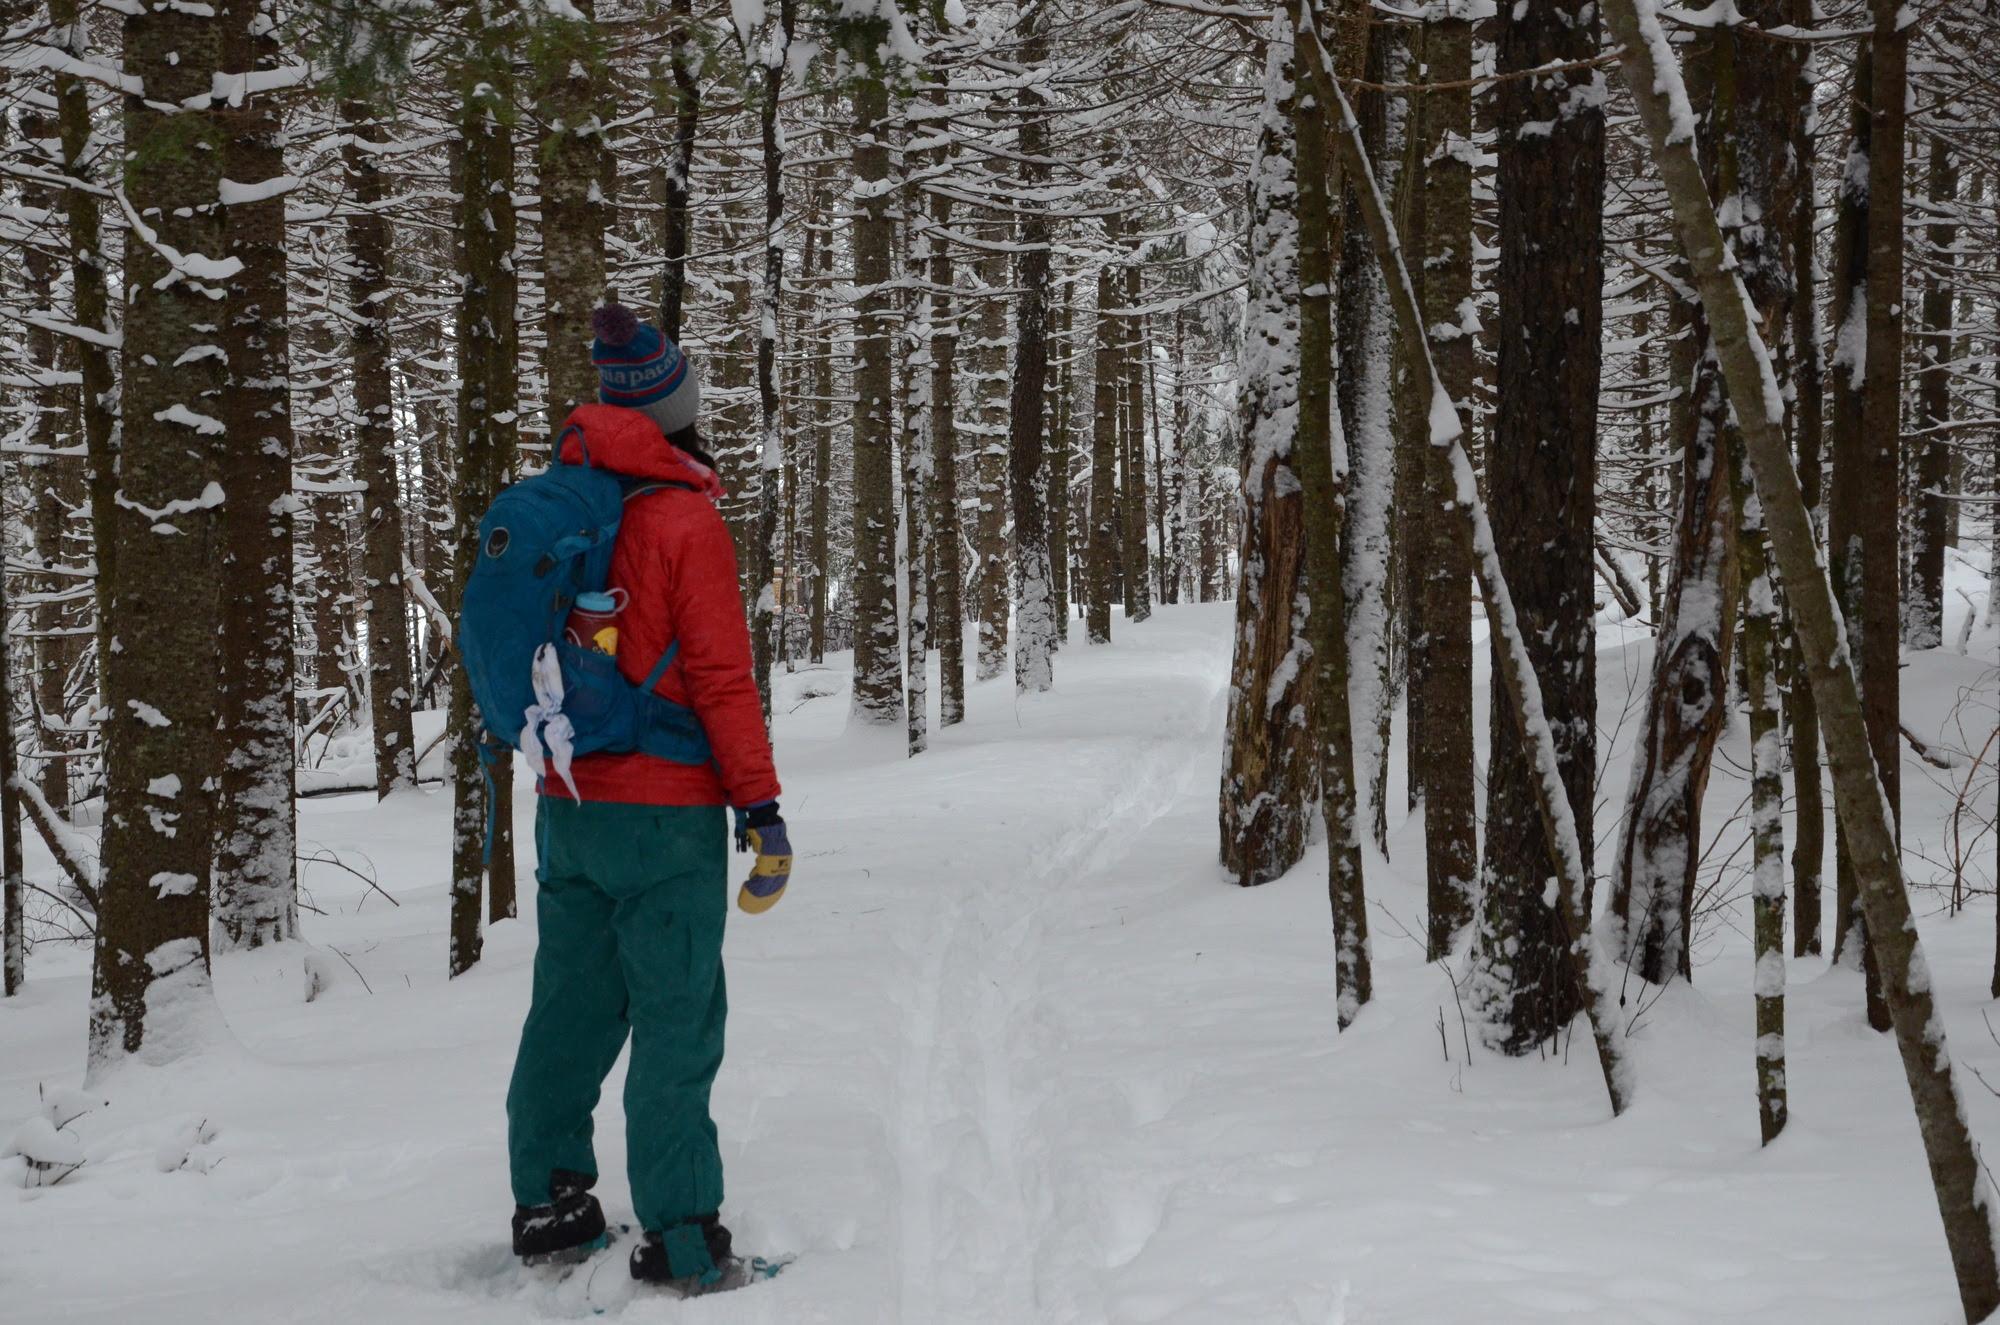 Snowshoer on snowy trail